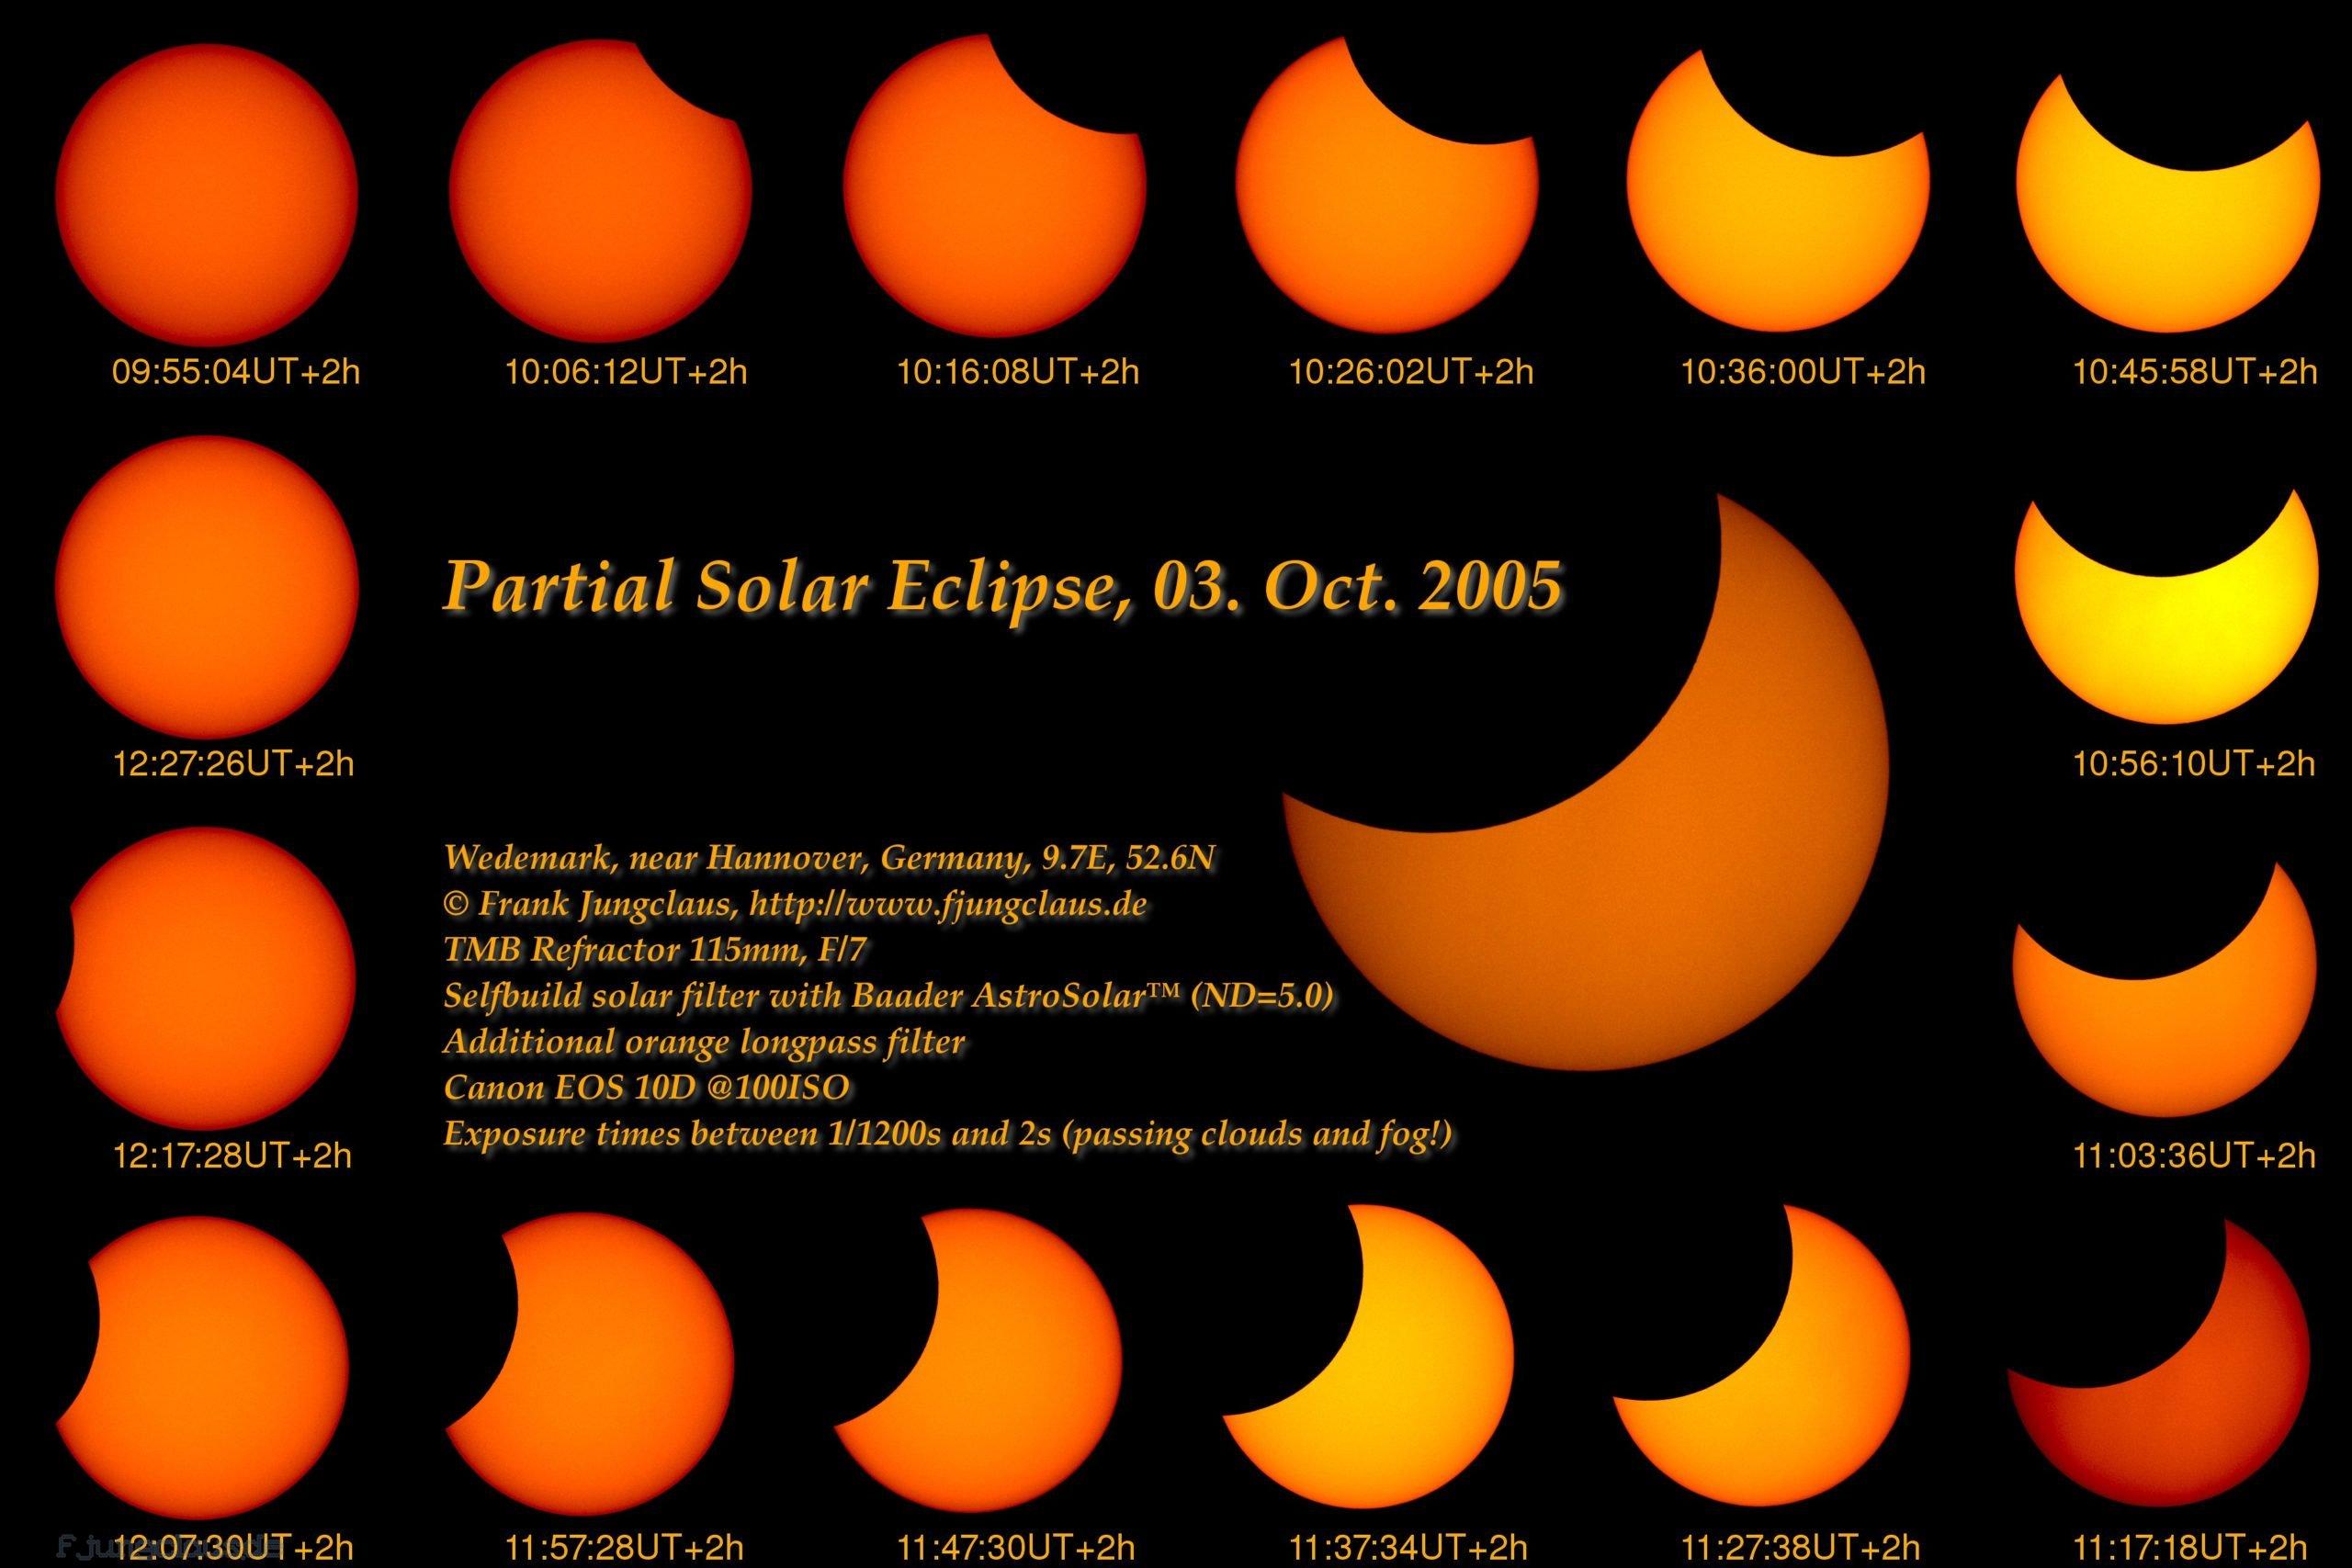 Partial Solar Eclipse, Oct 2005